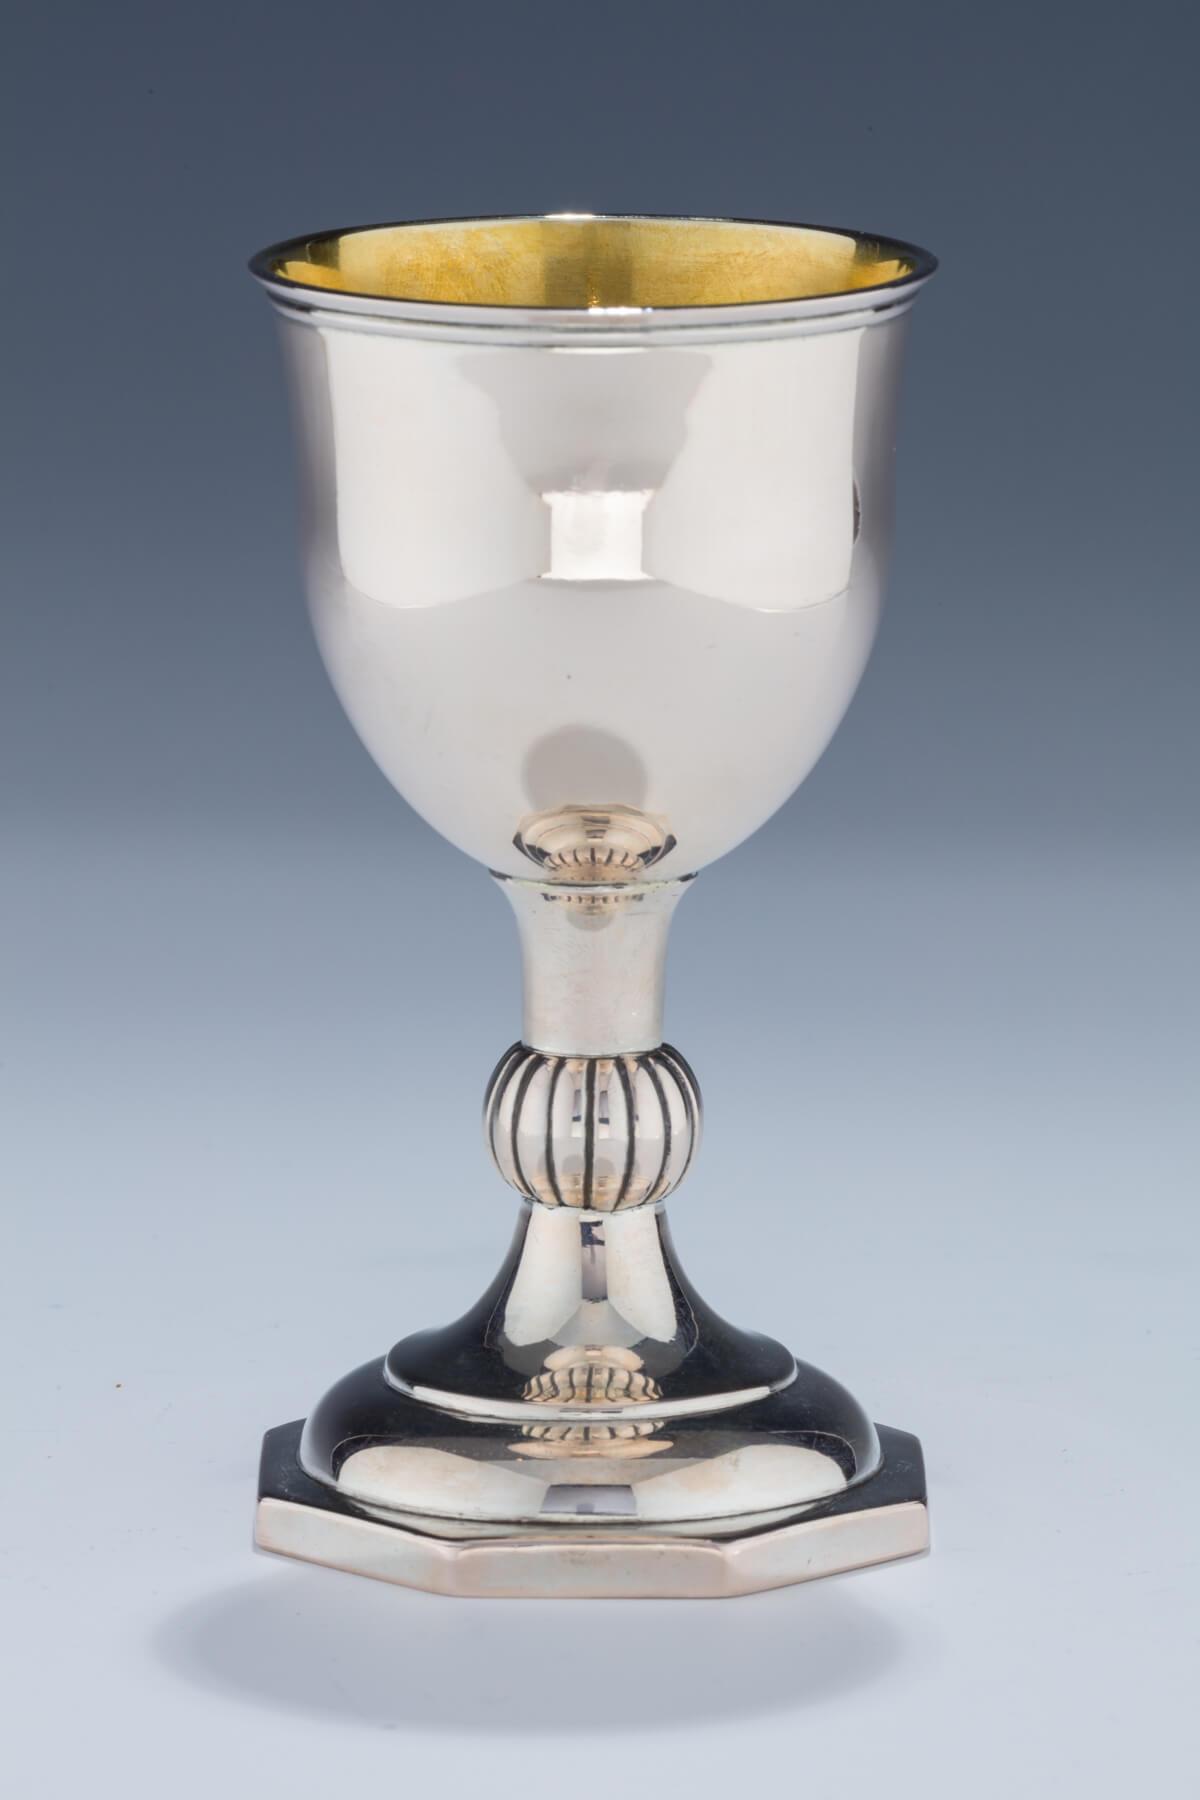 043. A Silver Kiddush Goblet